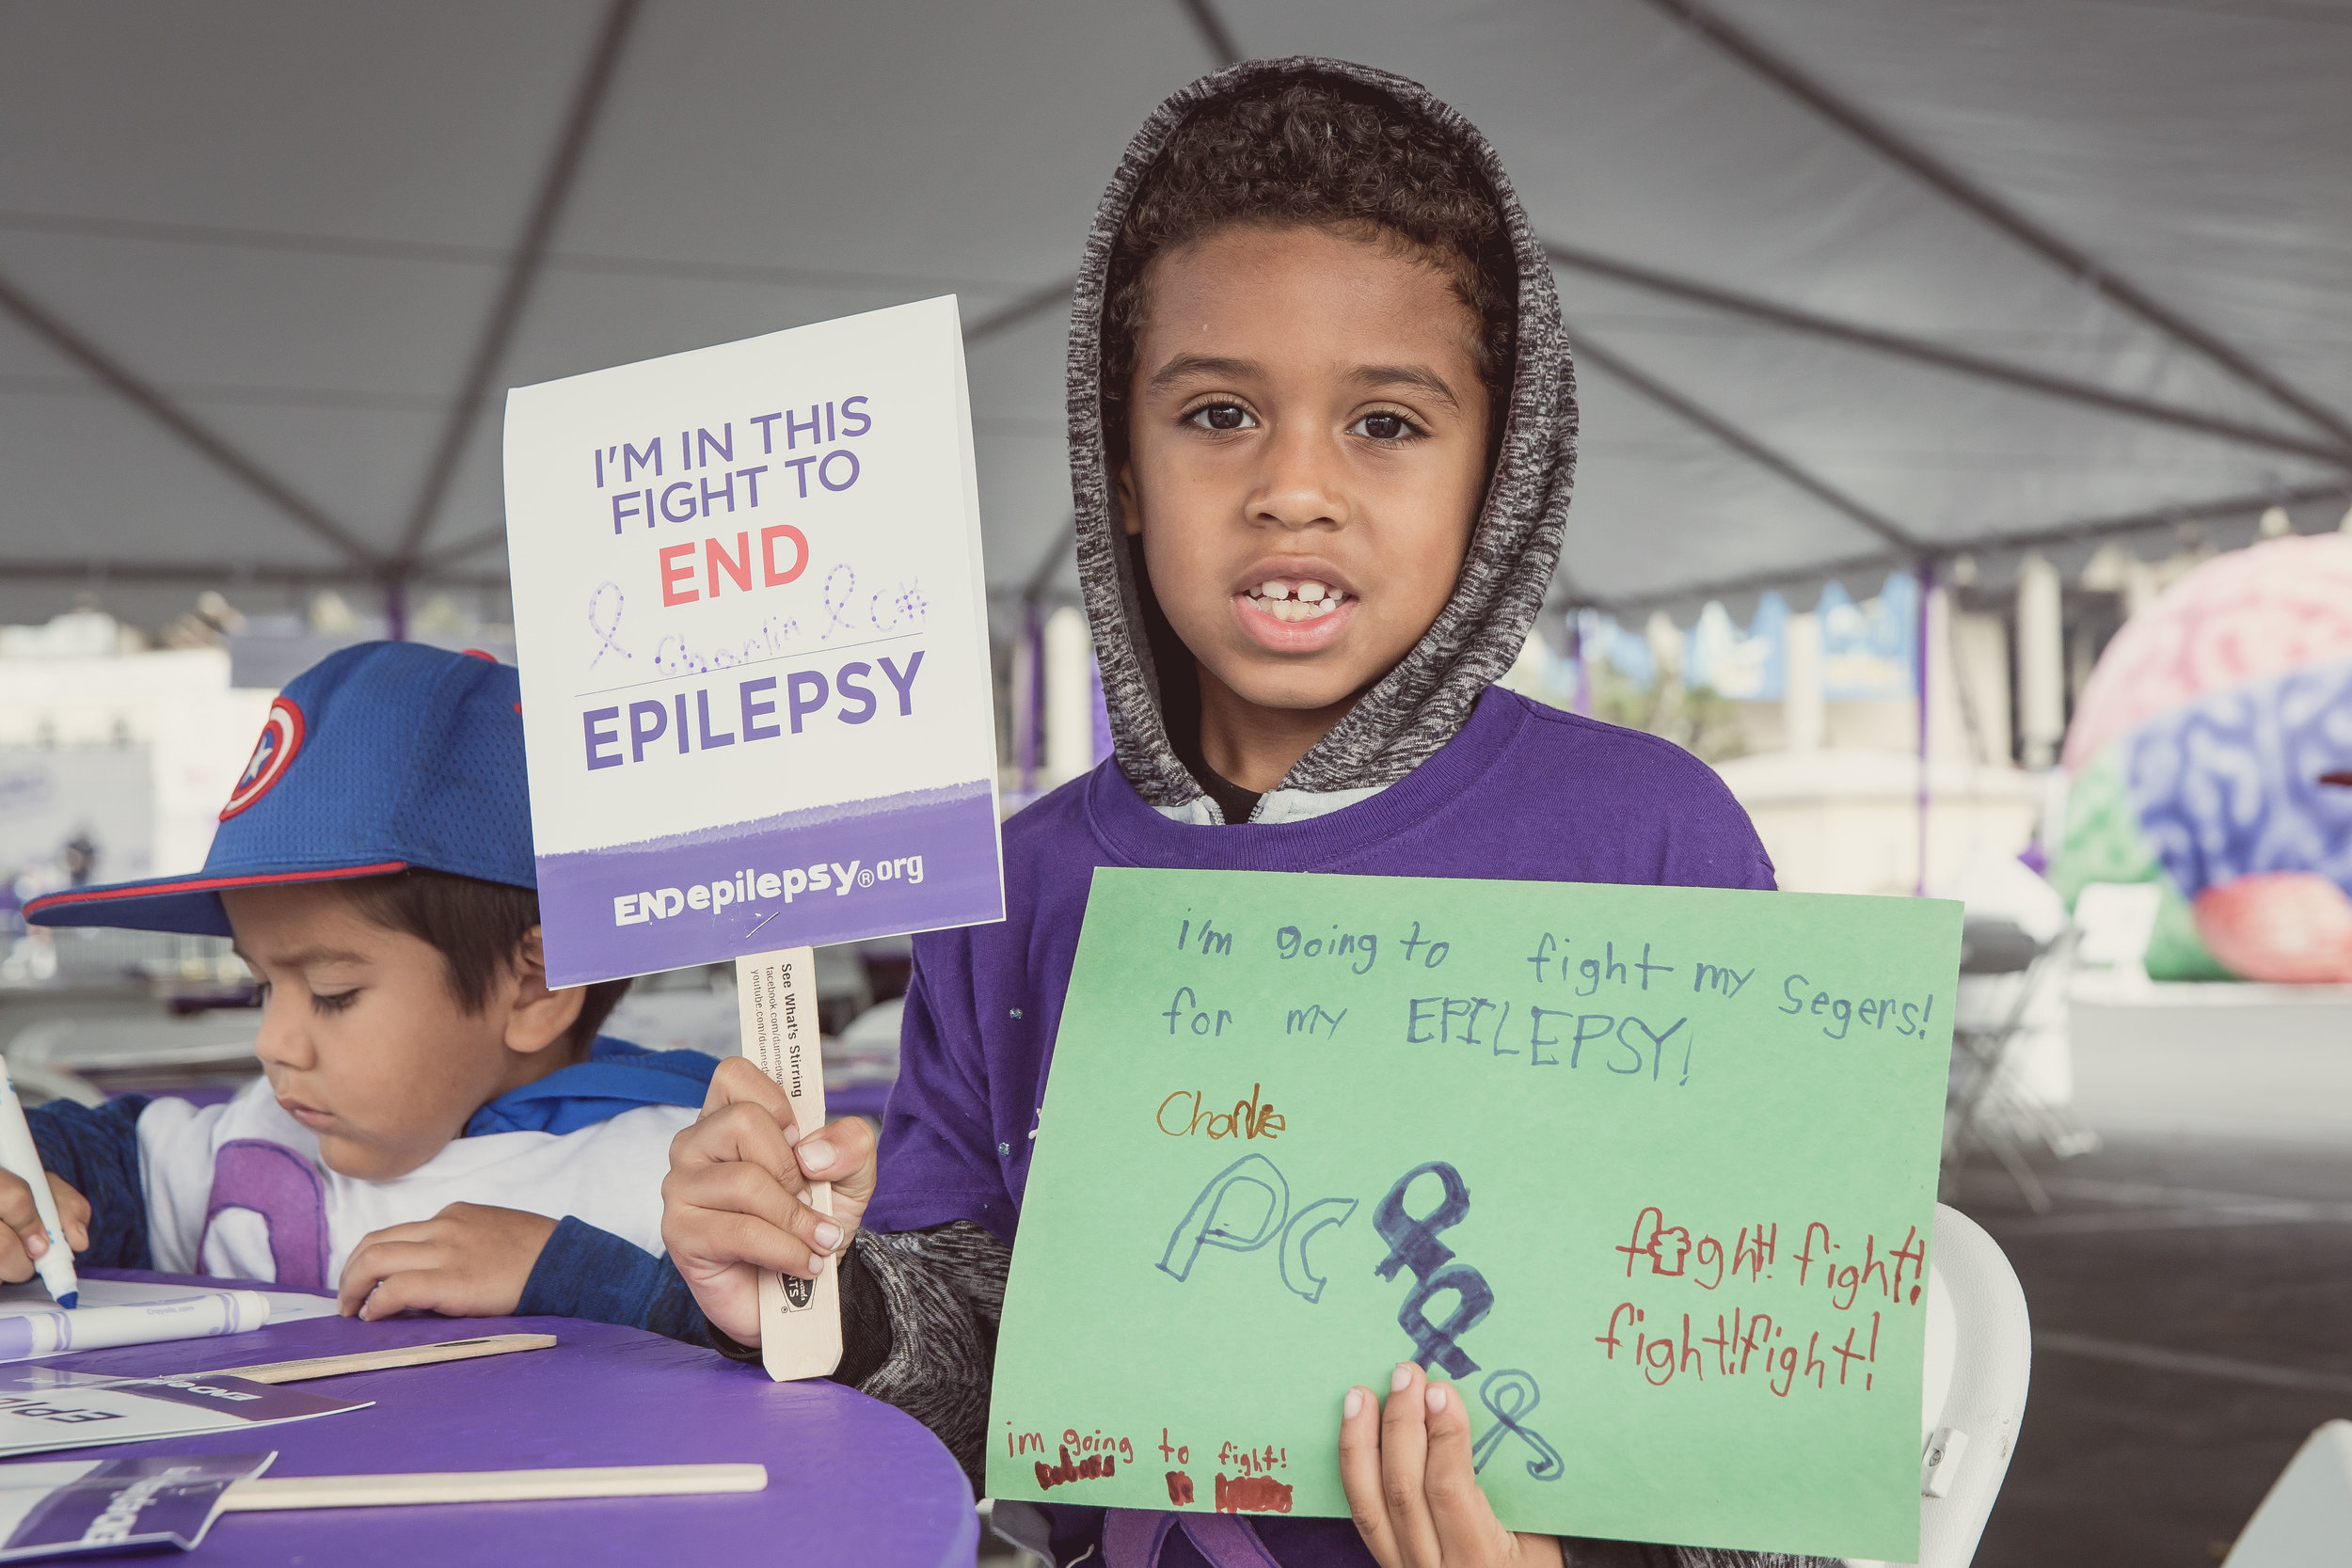 EndEpilepsy5K_2017_03.jpg